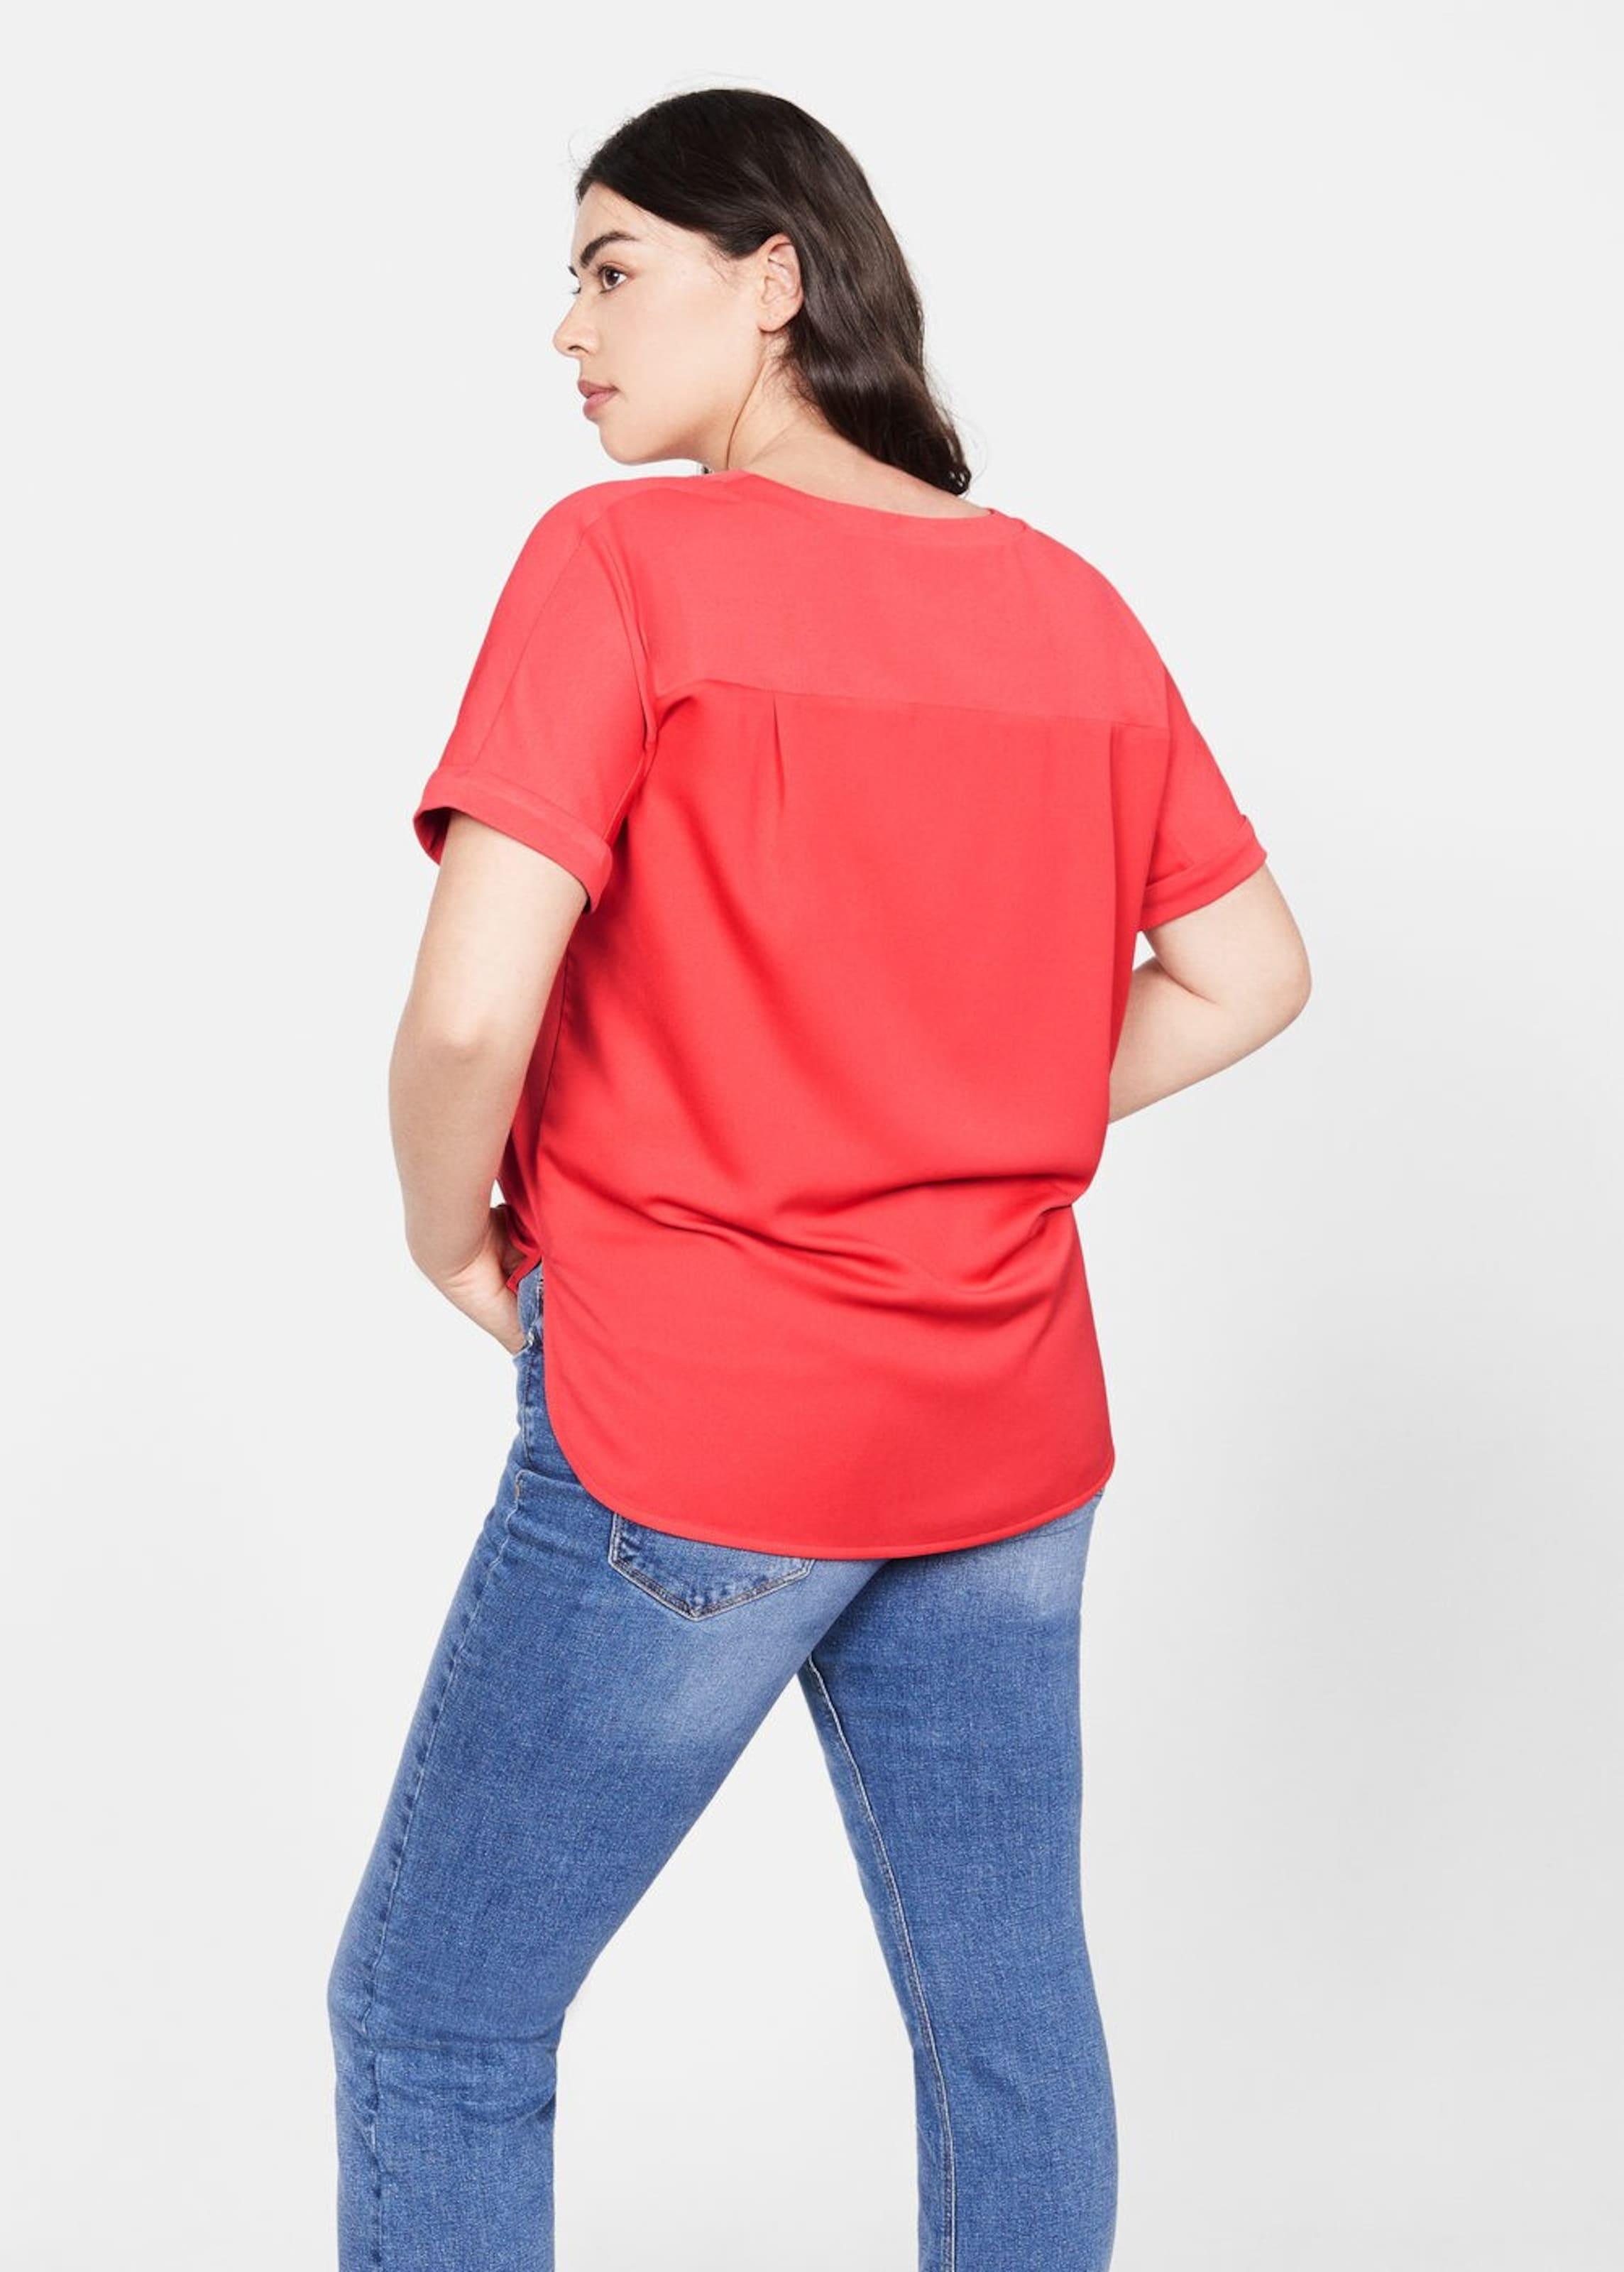 'salsa5' Violeta T shirt By Mango Weinrot In QrshCtd